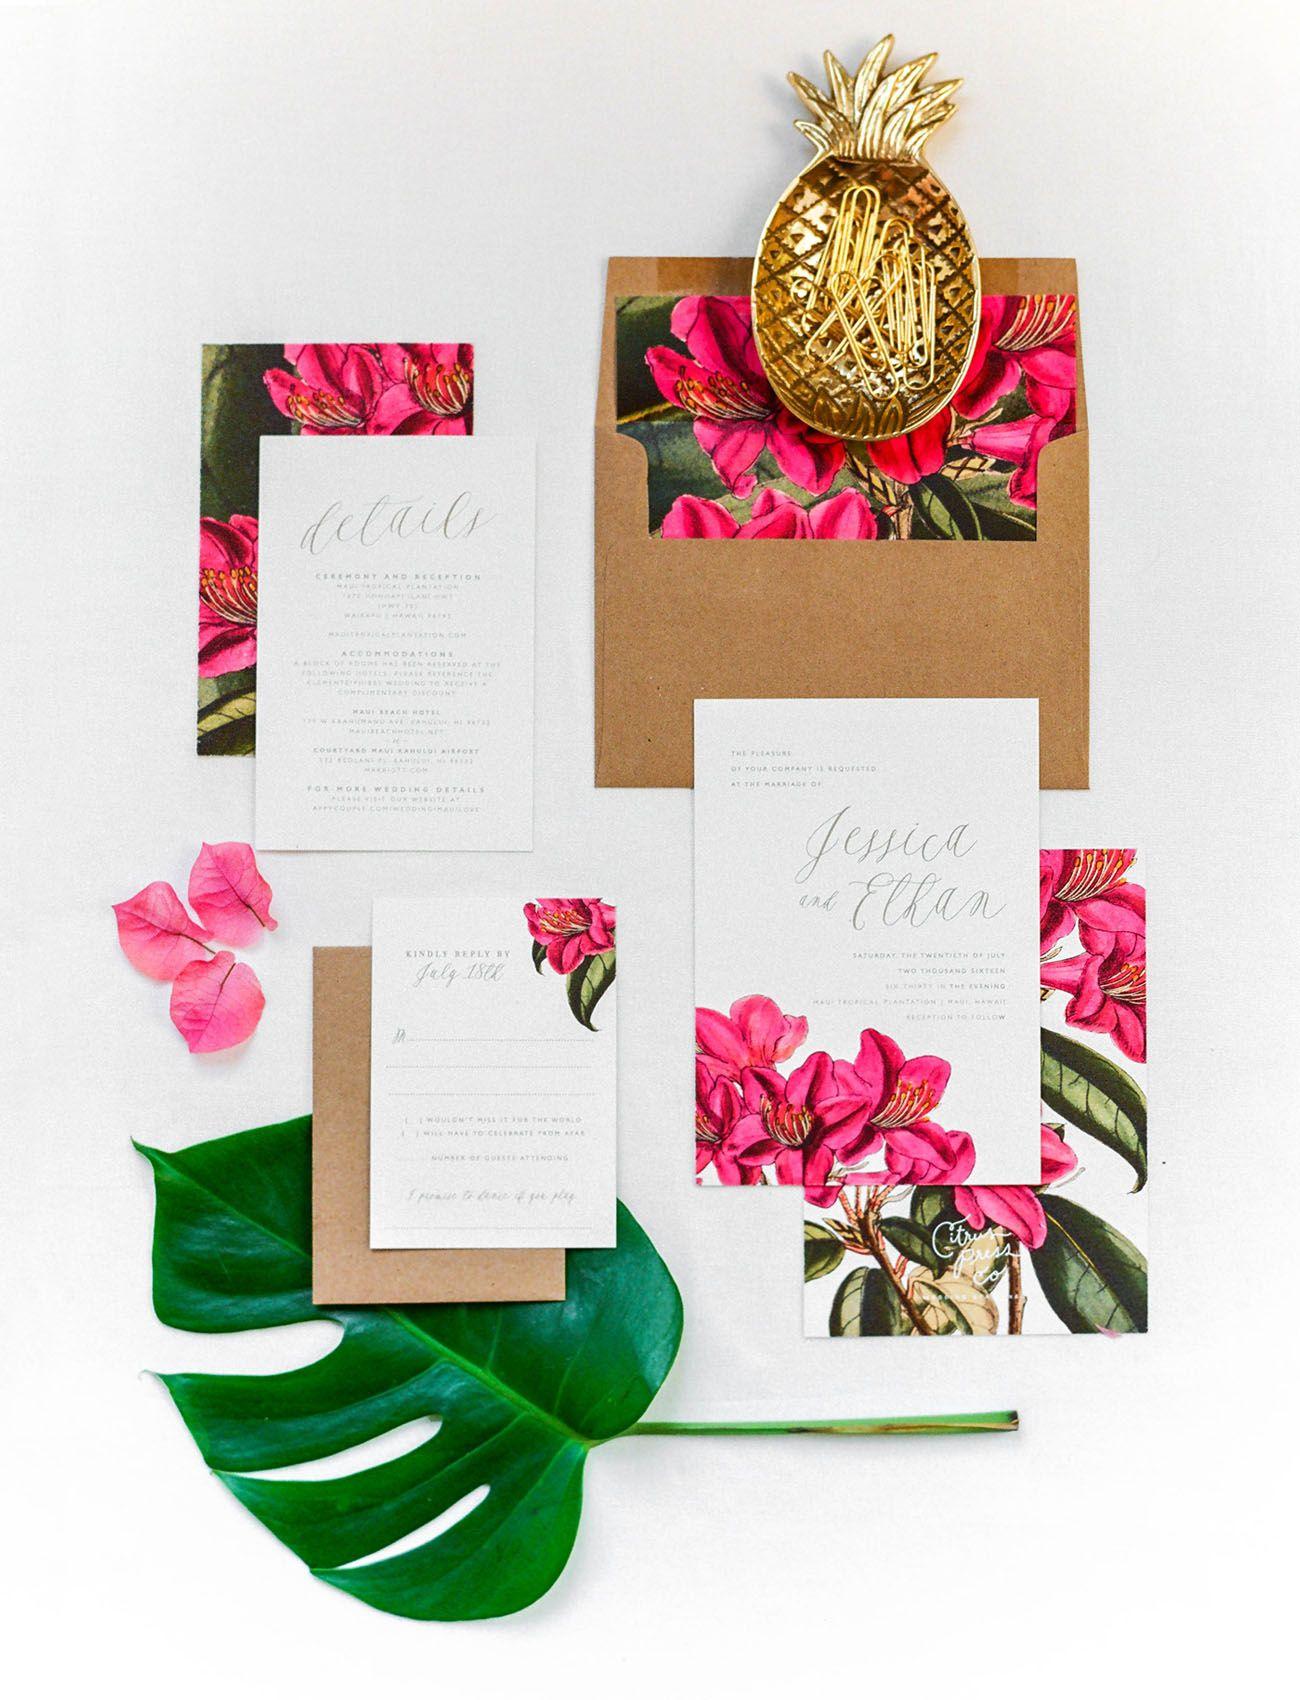 Tropical Bridal Inspiration in Maui, Hawaii | Maui weddings ...